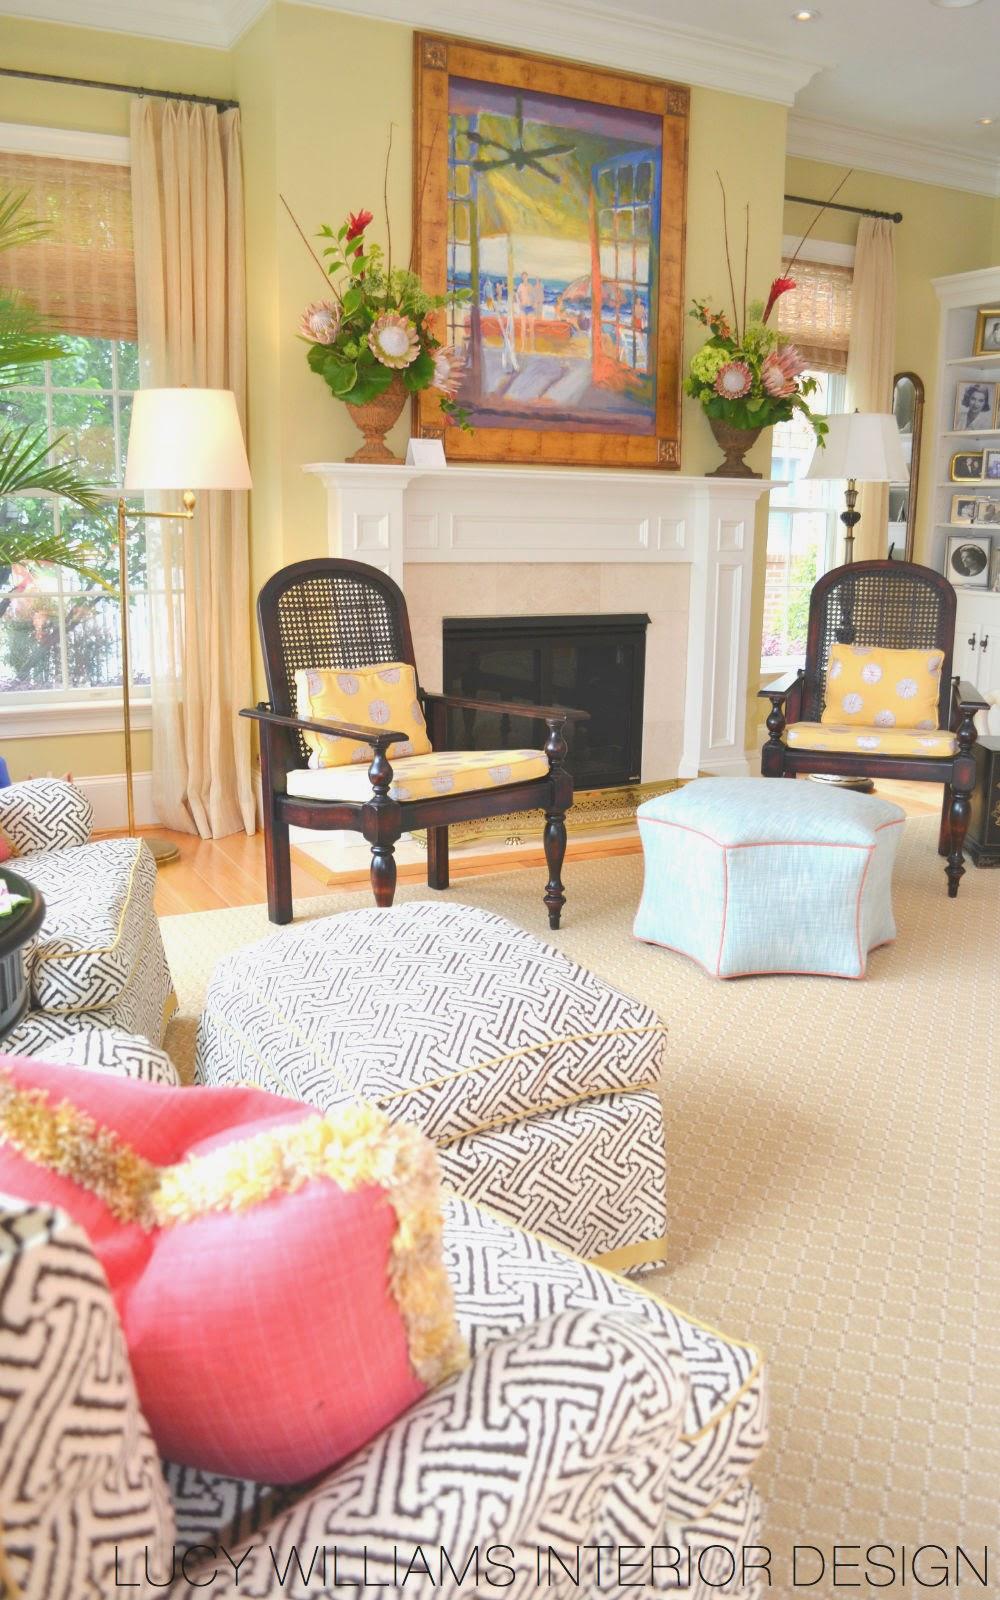 lucy williams interior design blog it 39 s garden week in virginia